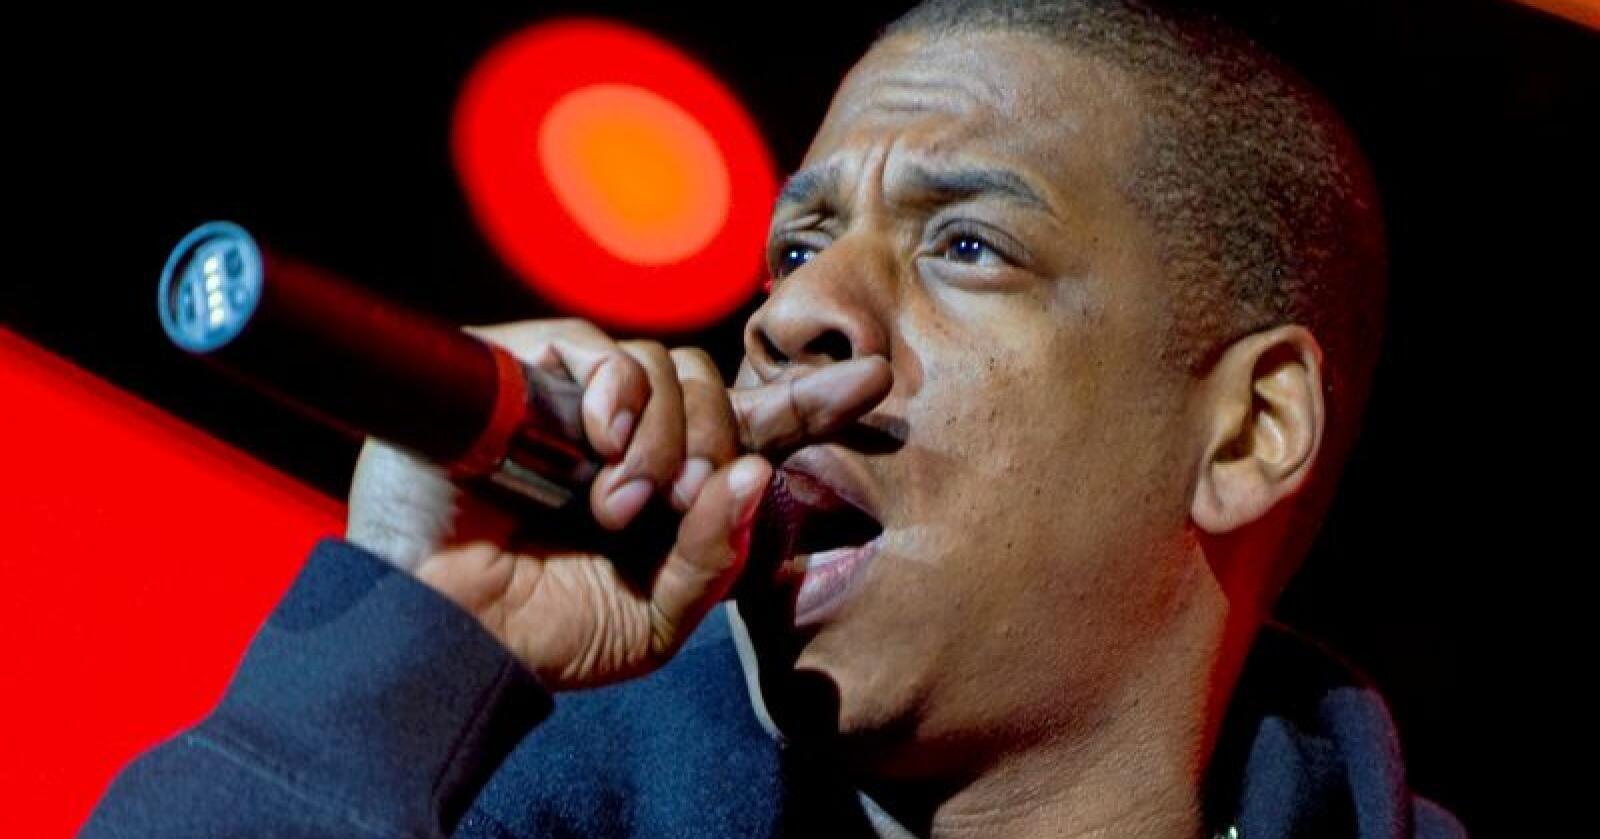 Verdensstjernen Jay-Z som er gift med Beyoncé vil satse på marihuana. Foto: Claudio Bresciani / SCANPIX